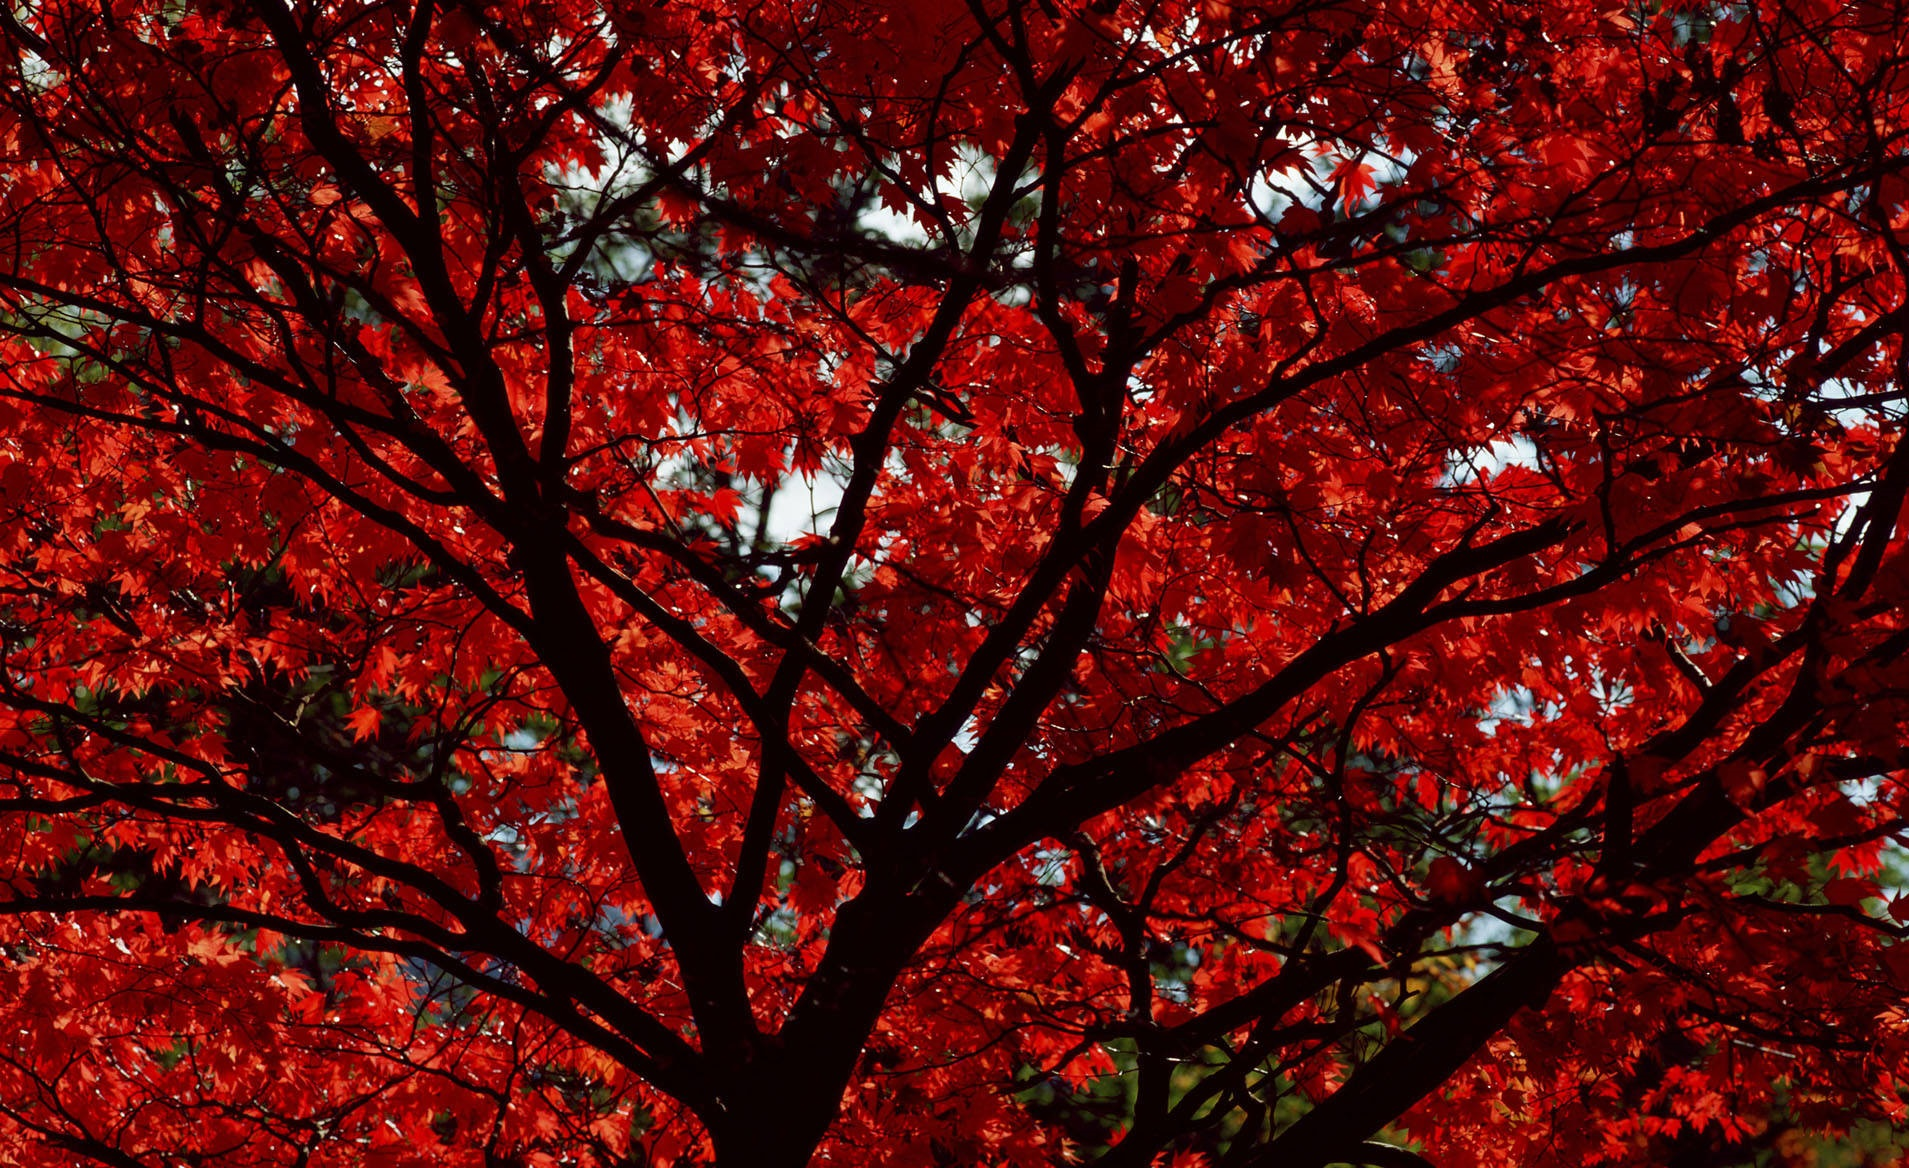 Red-fall-leaves-wallpaper-images-5emok